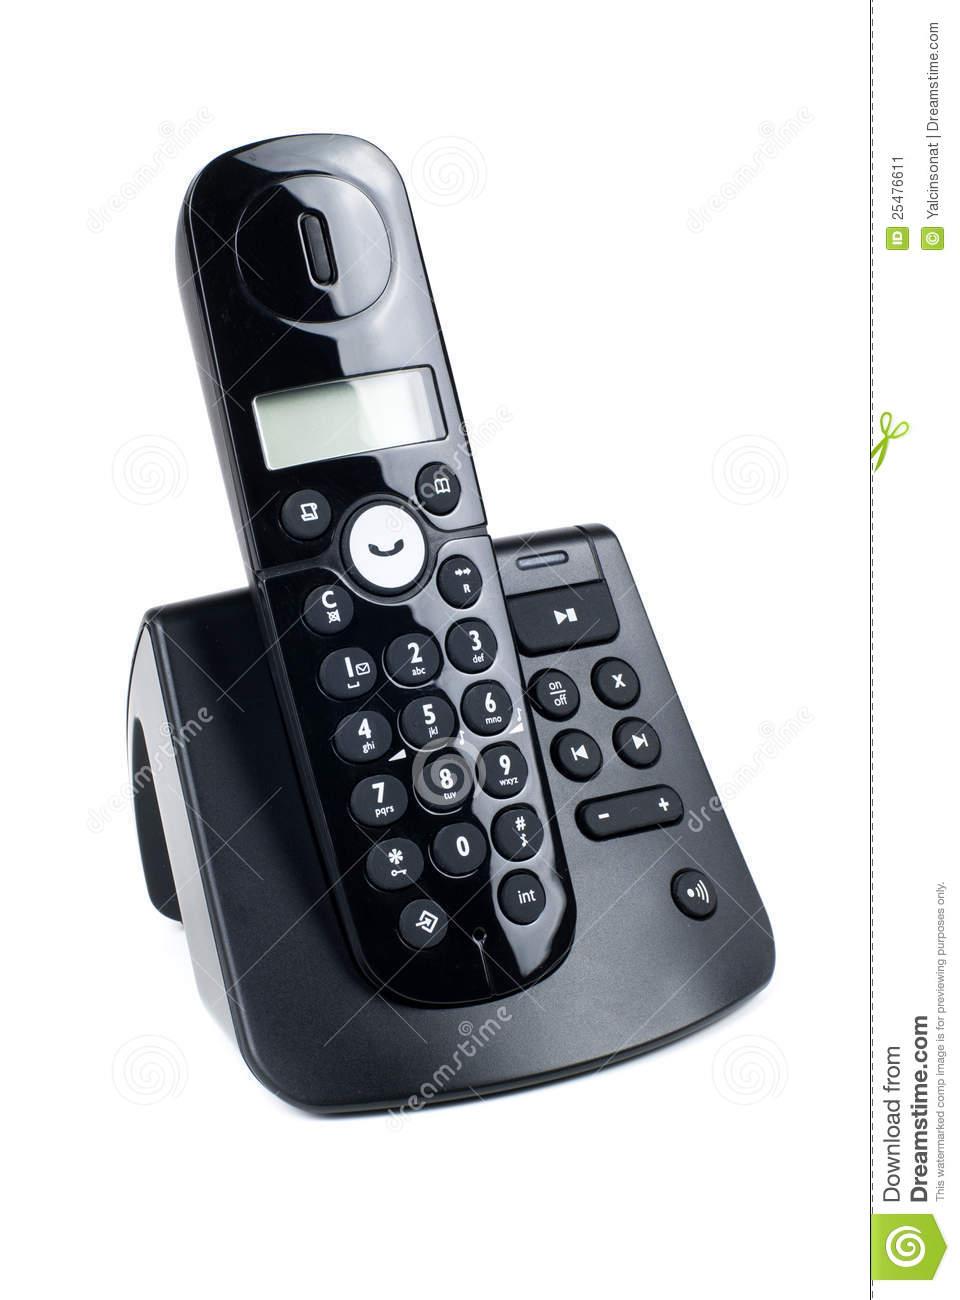 Cordless telephone clipart.